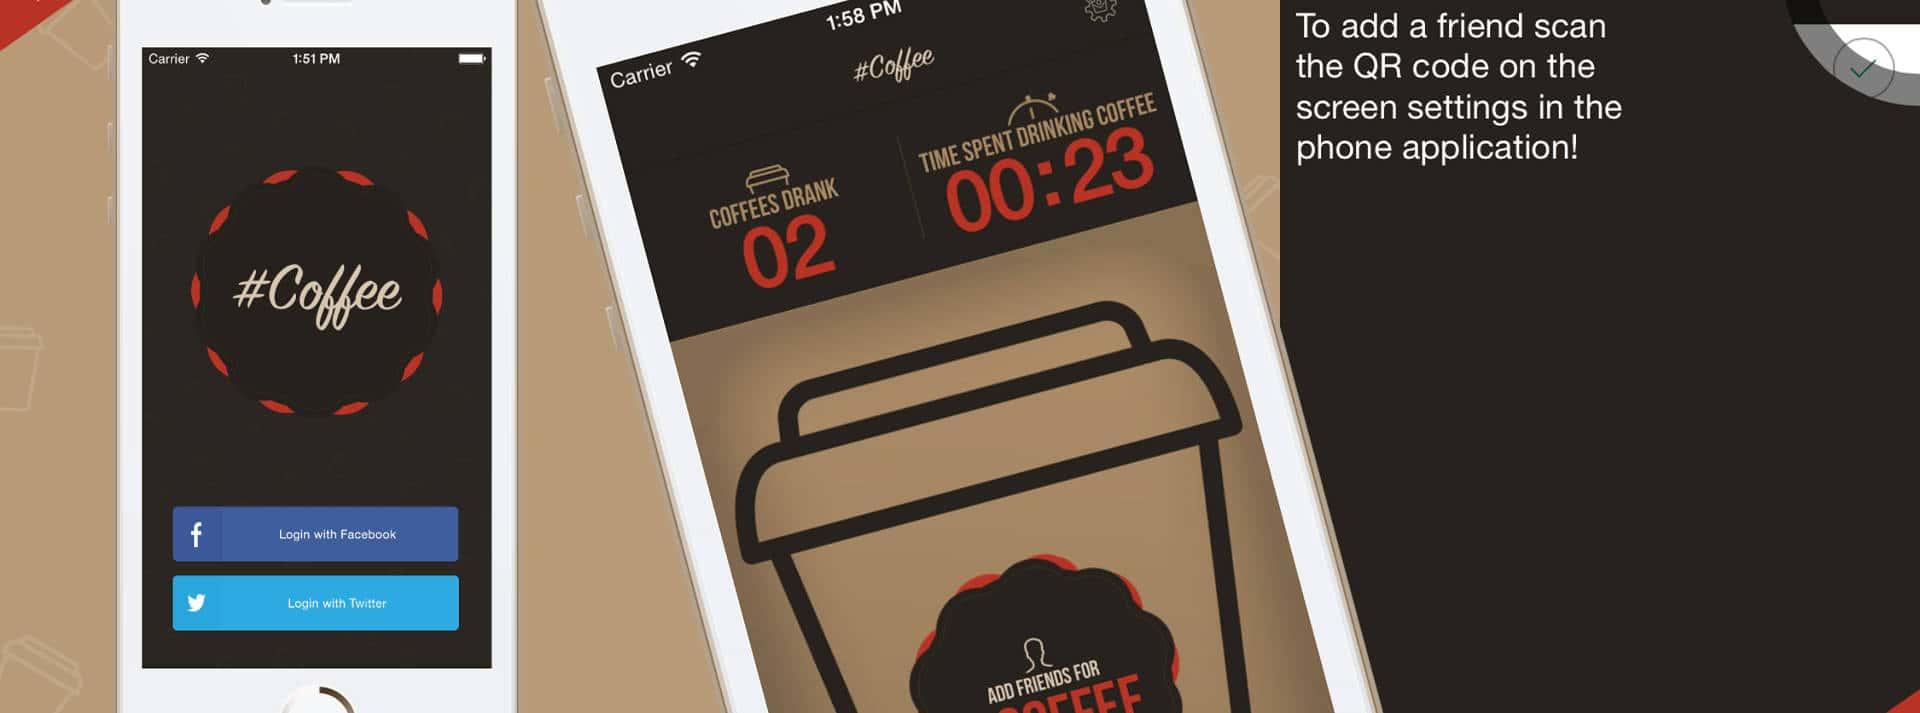 mobile application case study